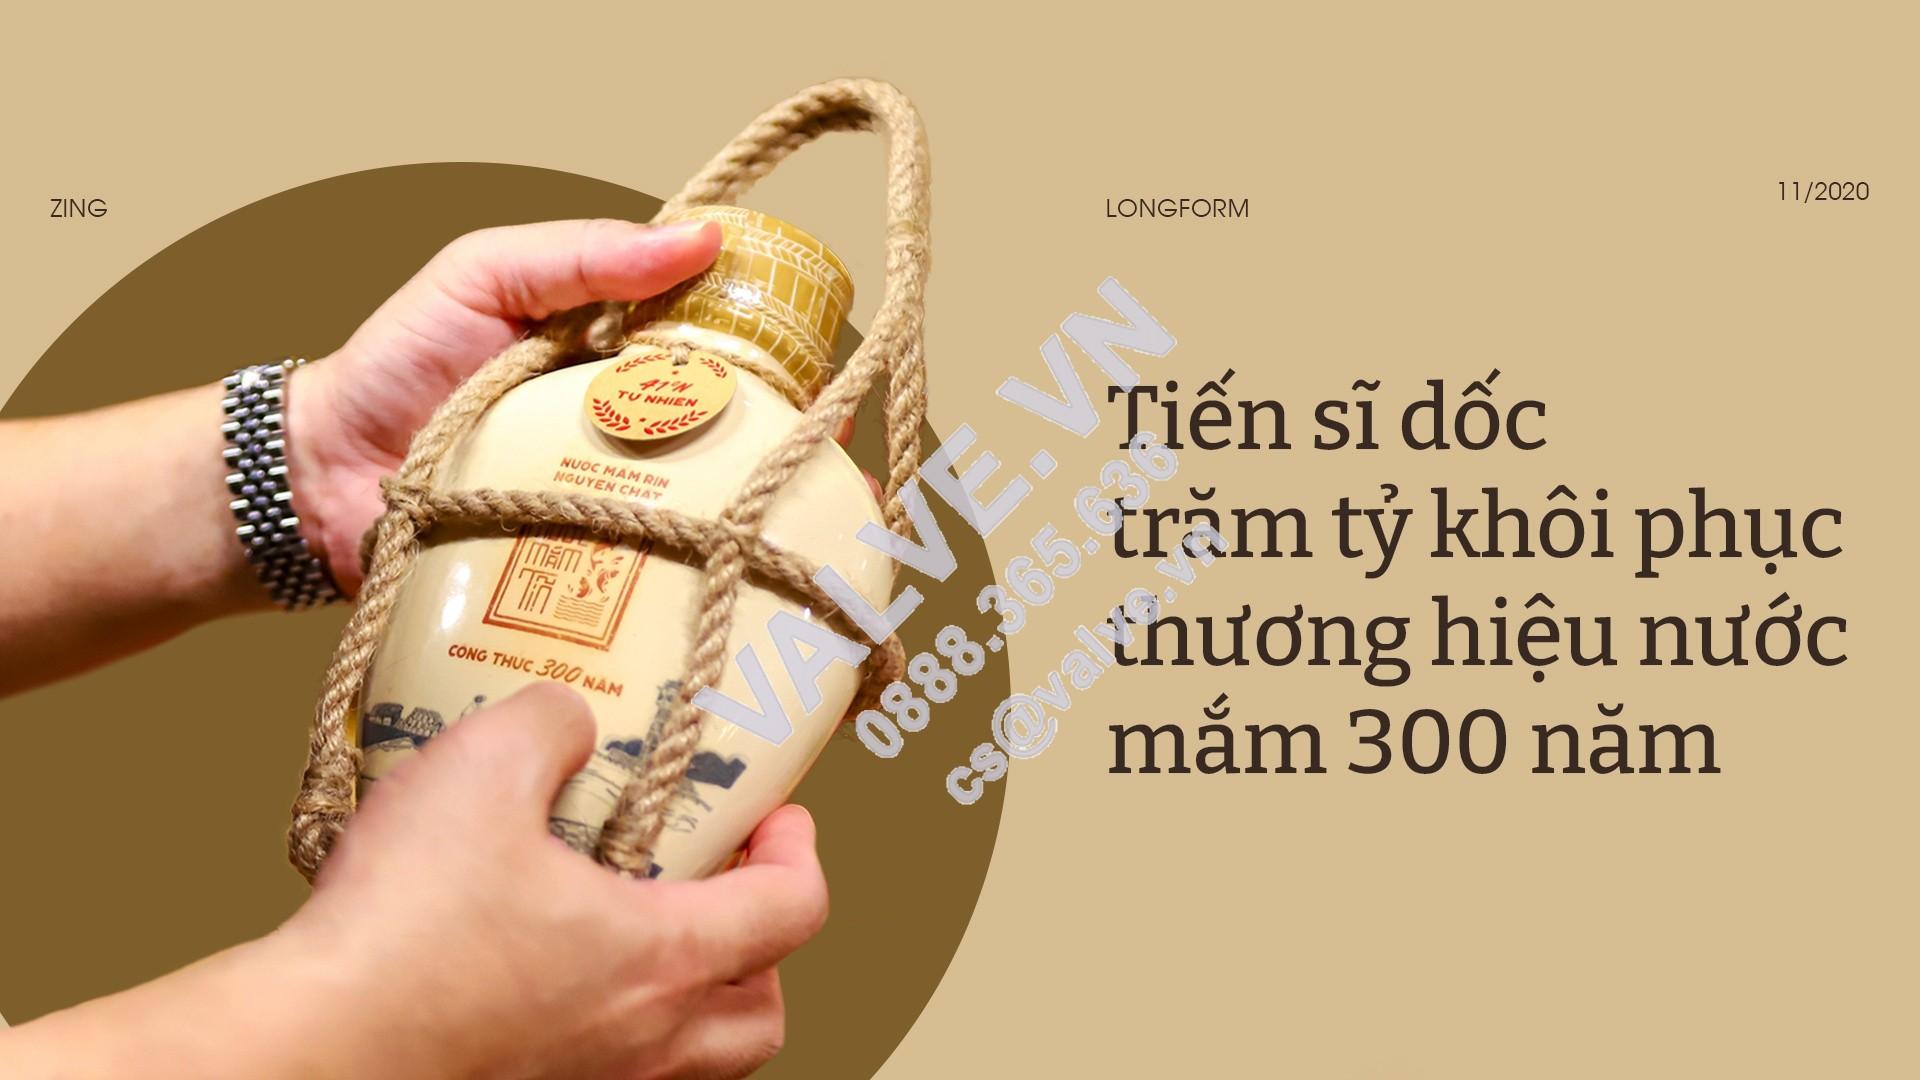 tien-si-doc-tram-ty-khoi-phuc-thuong-hieu-nuoc-mam-300-nam-1